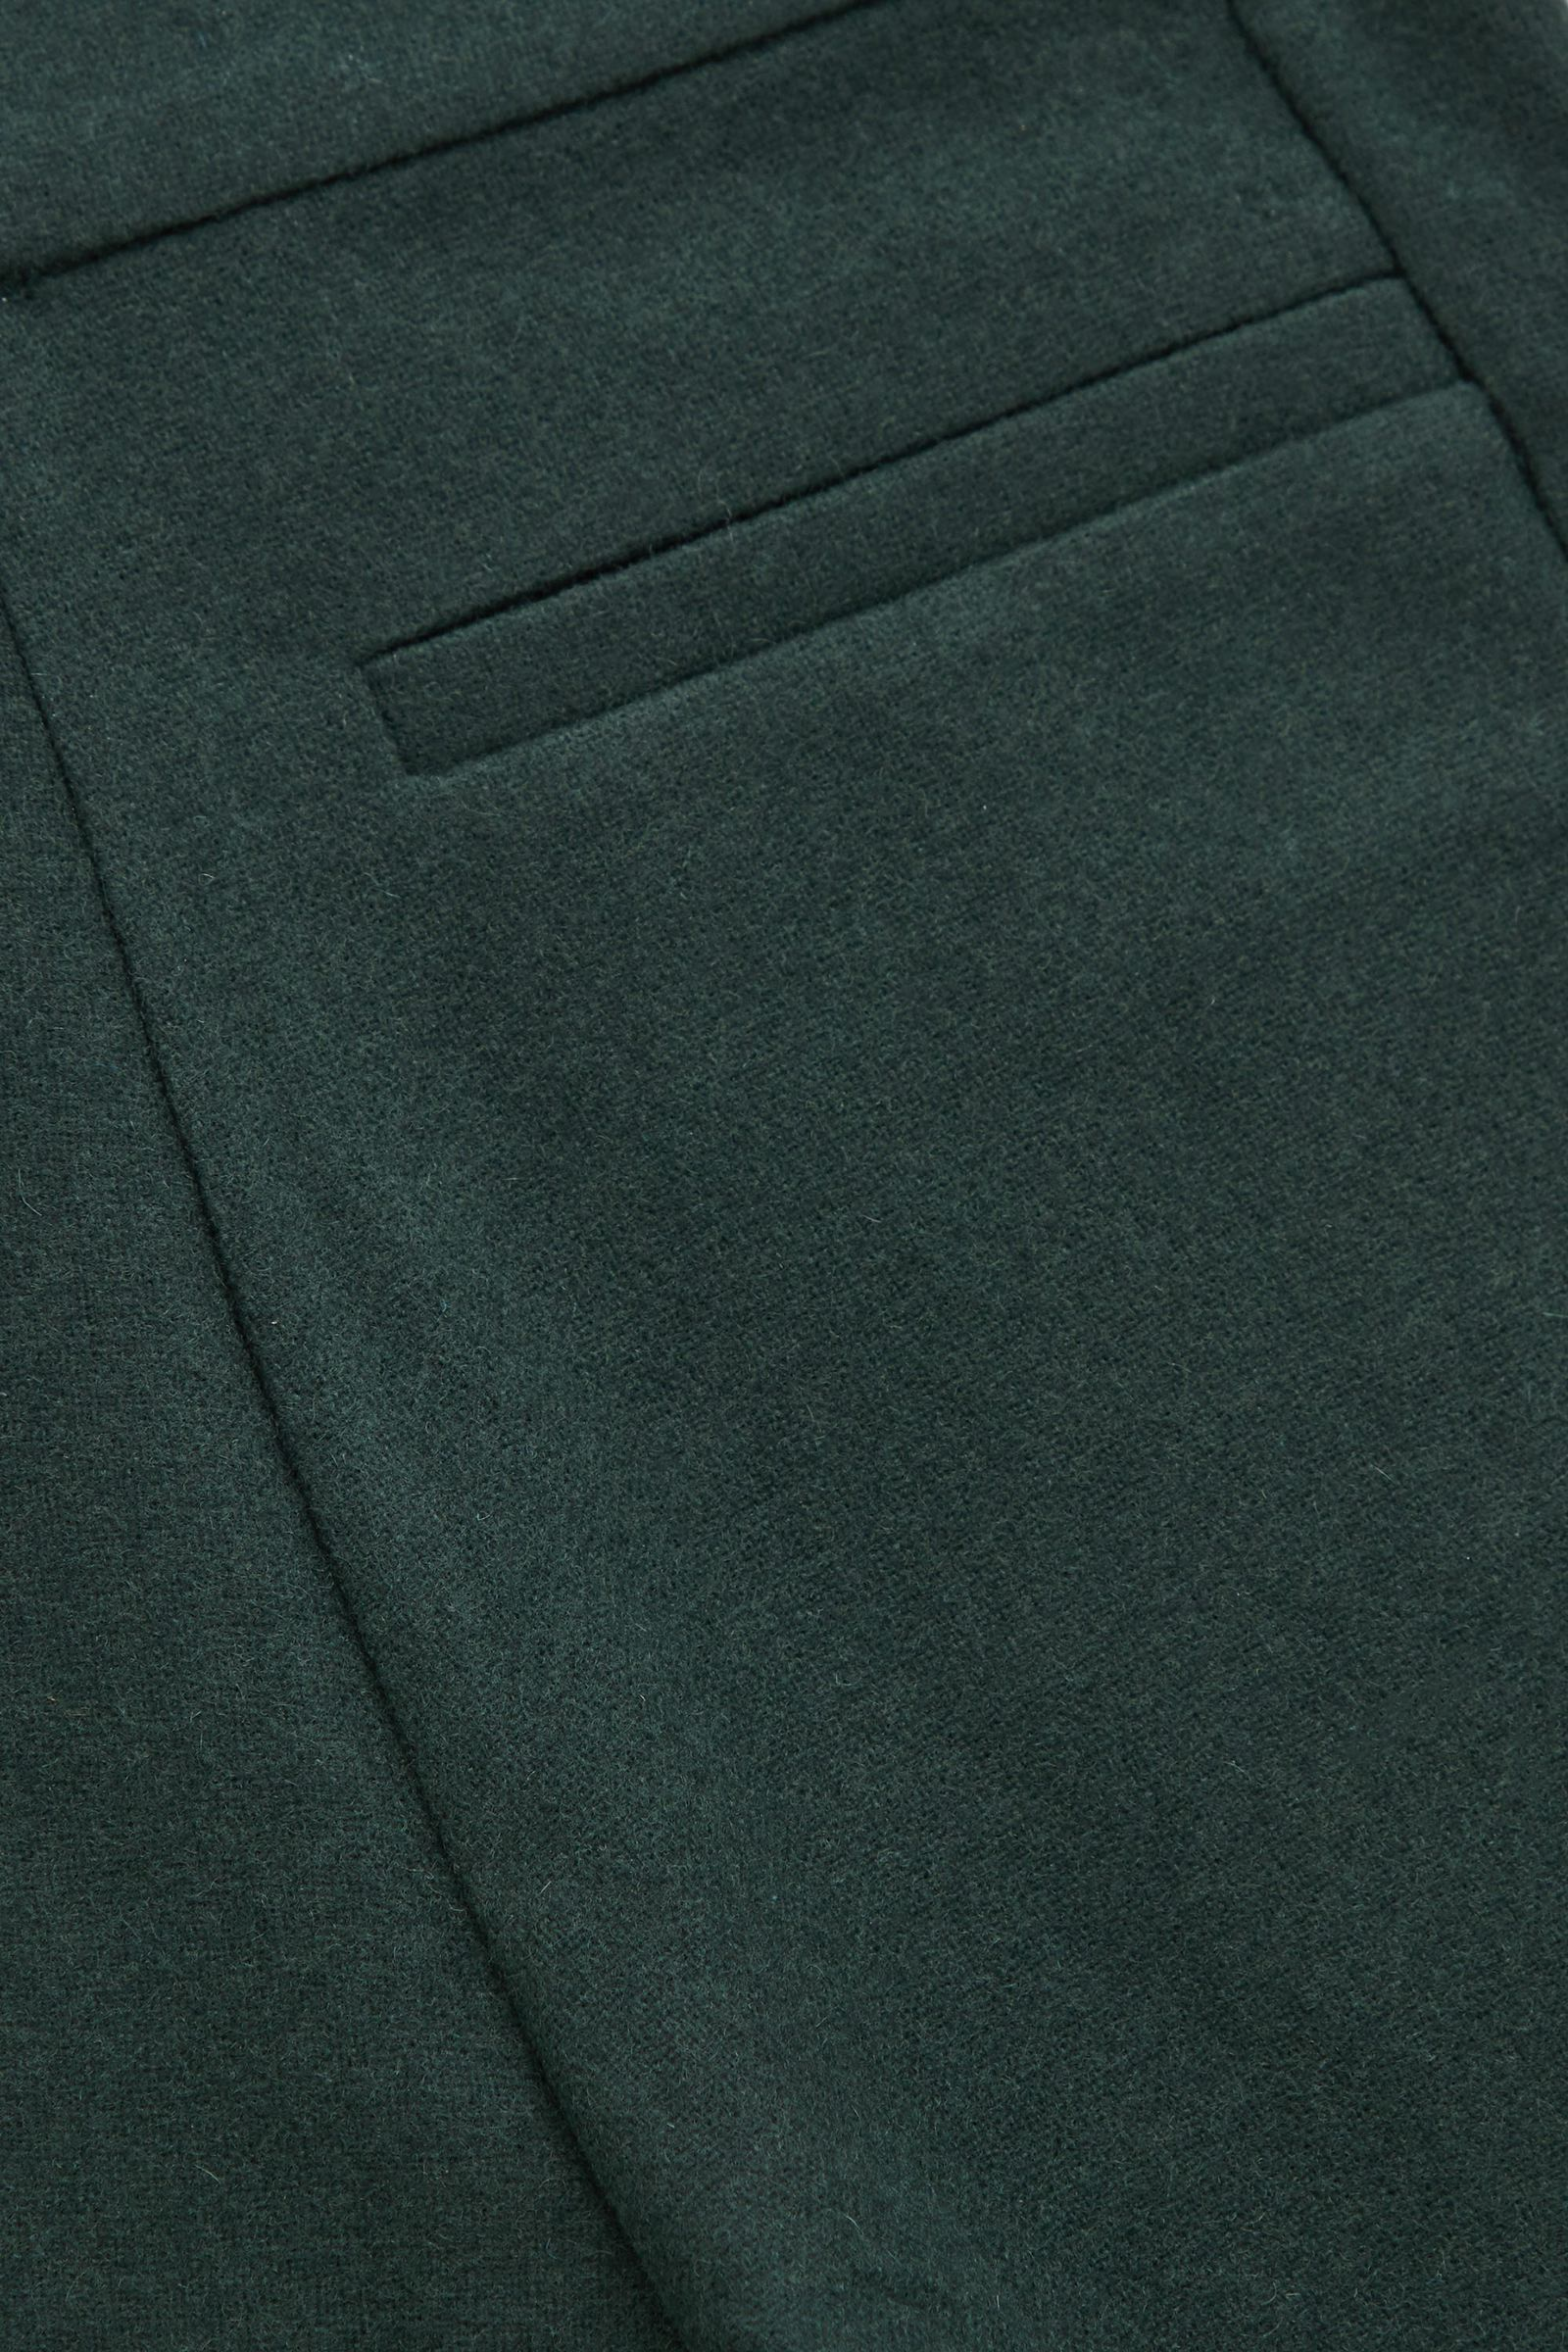 COS 레귤러 핏 울 트라우저의 다크 그린컬러 Detail입니다.